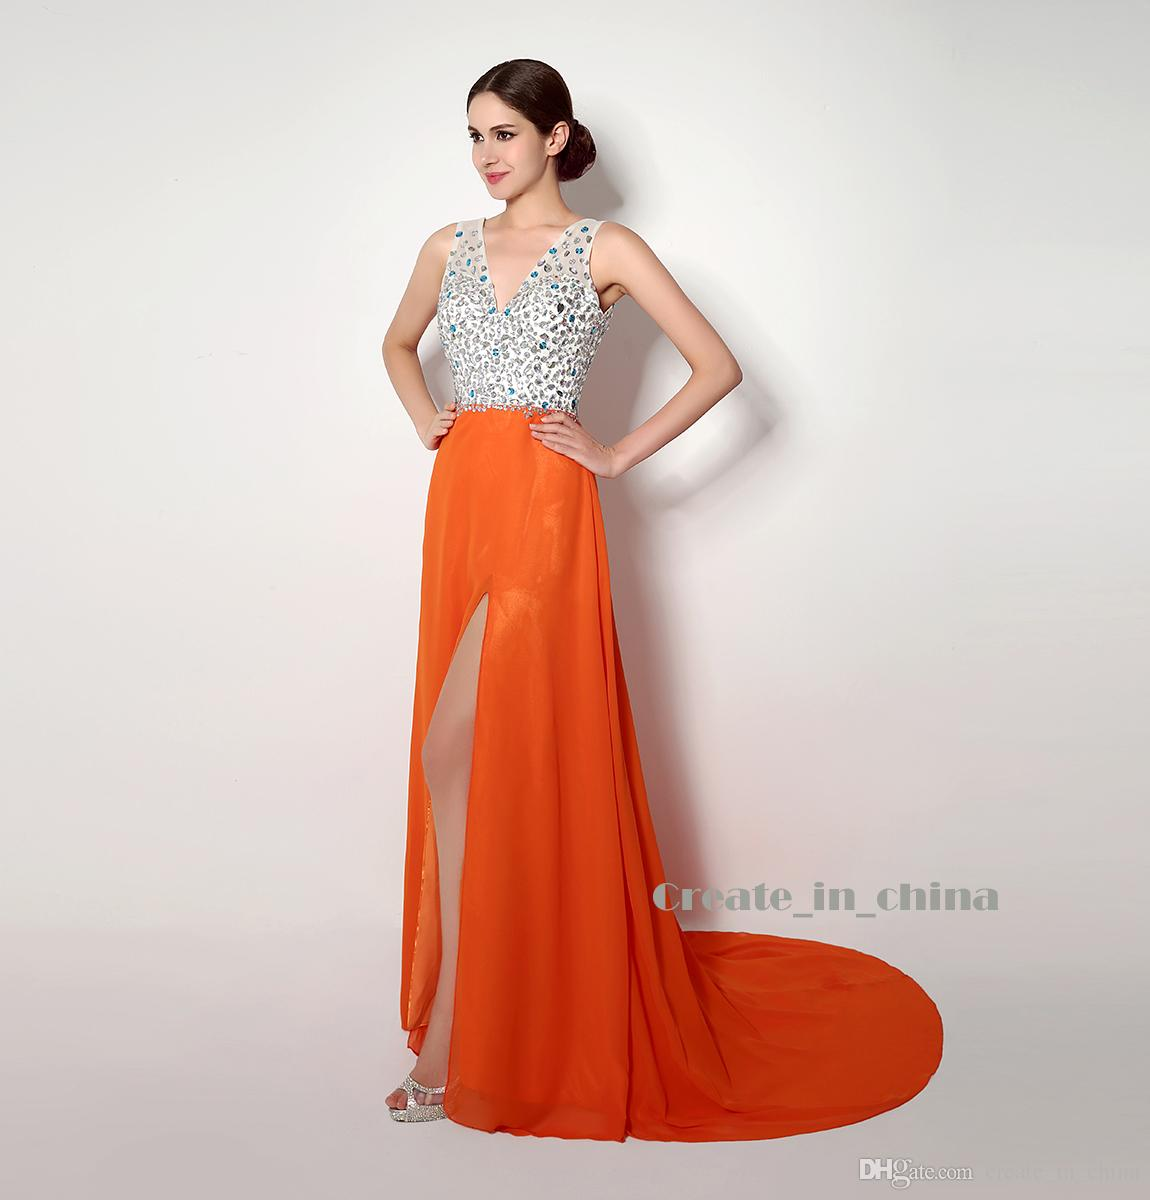 Party Dresses V-neck Split front Silver and Orange Hit Long Skirt Blakless Stain Wedding dresses In Stock Dresses Purple Bridal Real Photo